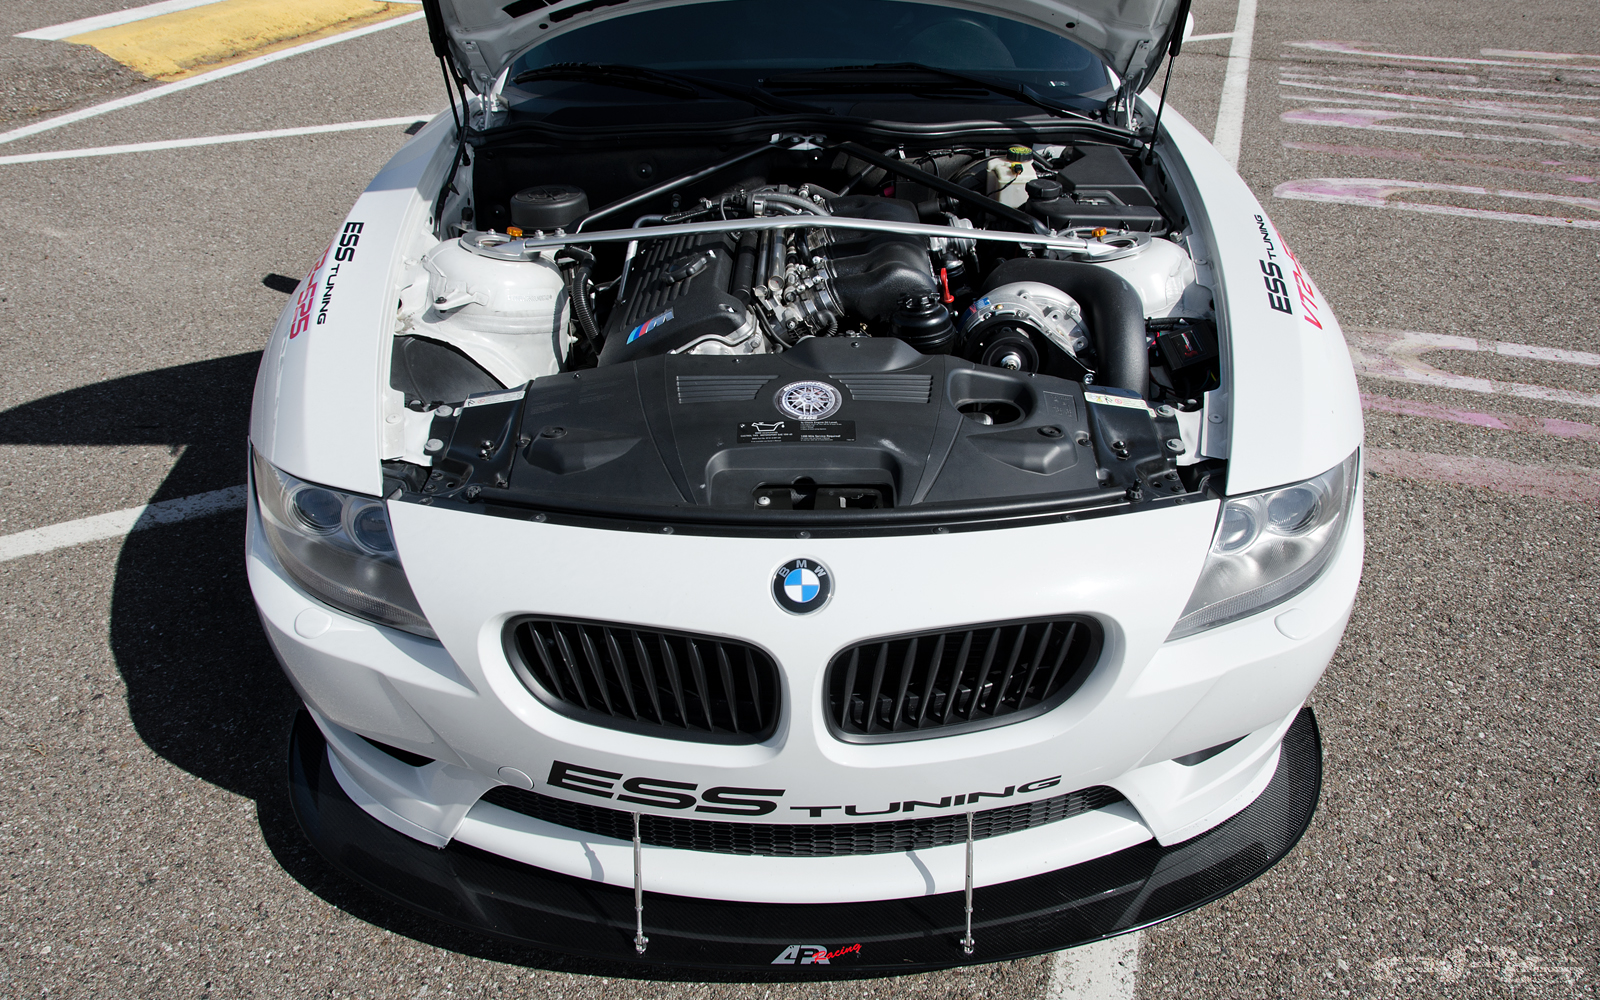 Eas Project Z4m Update Bmw Performance Parts Amp Services